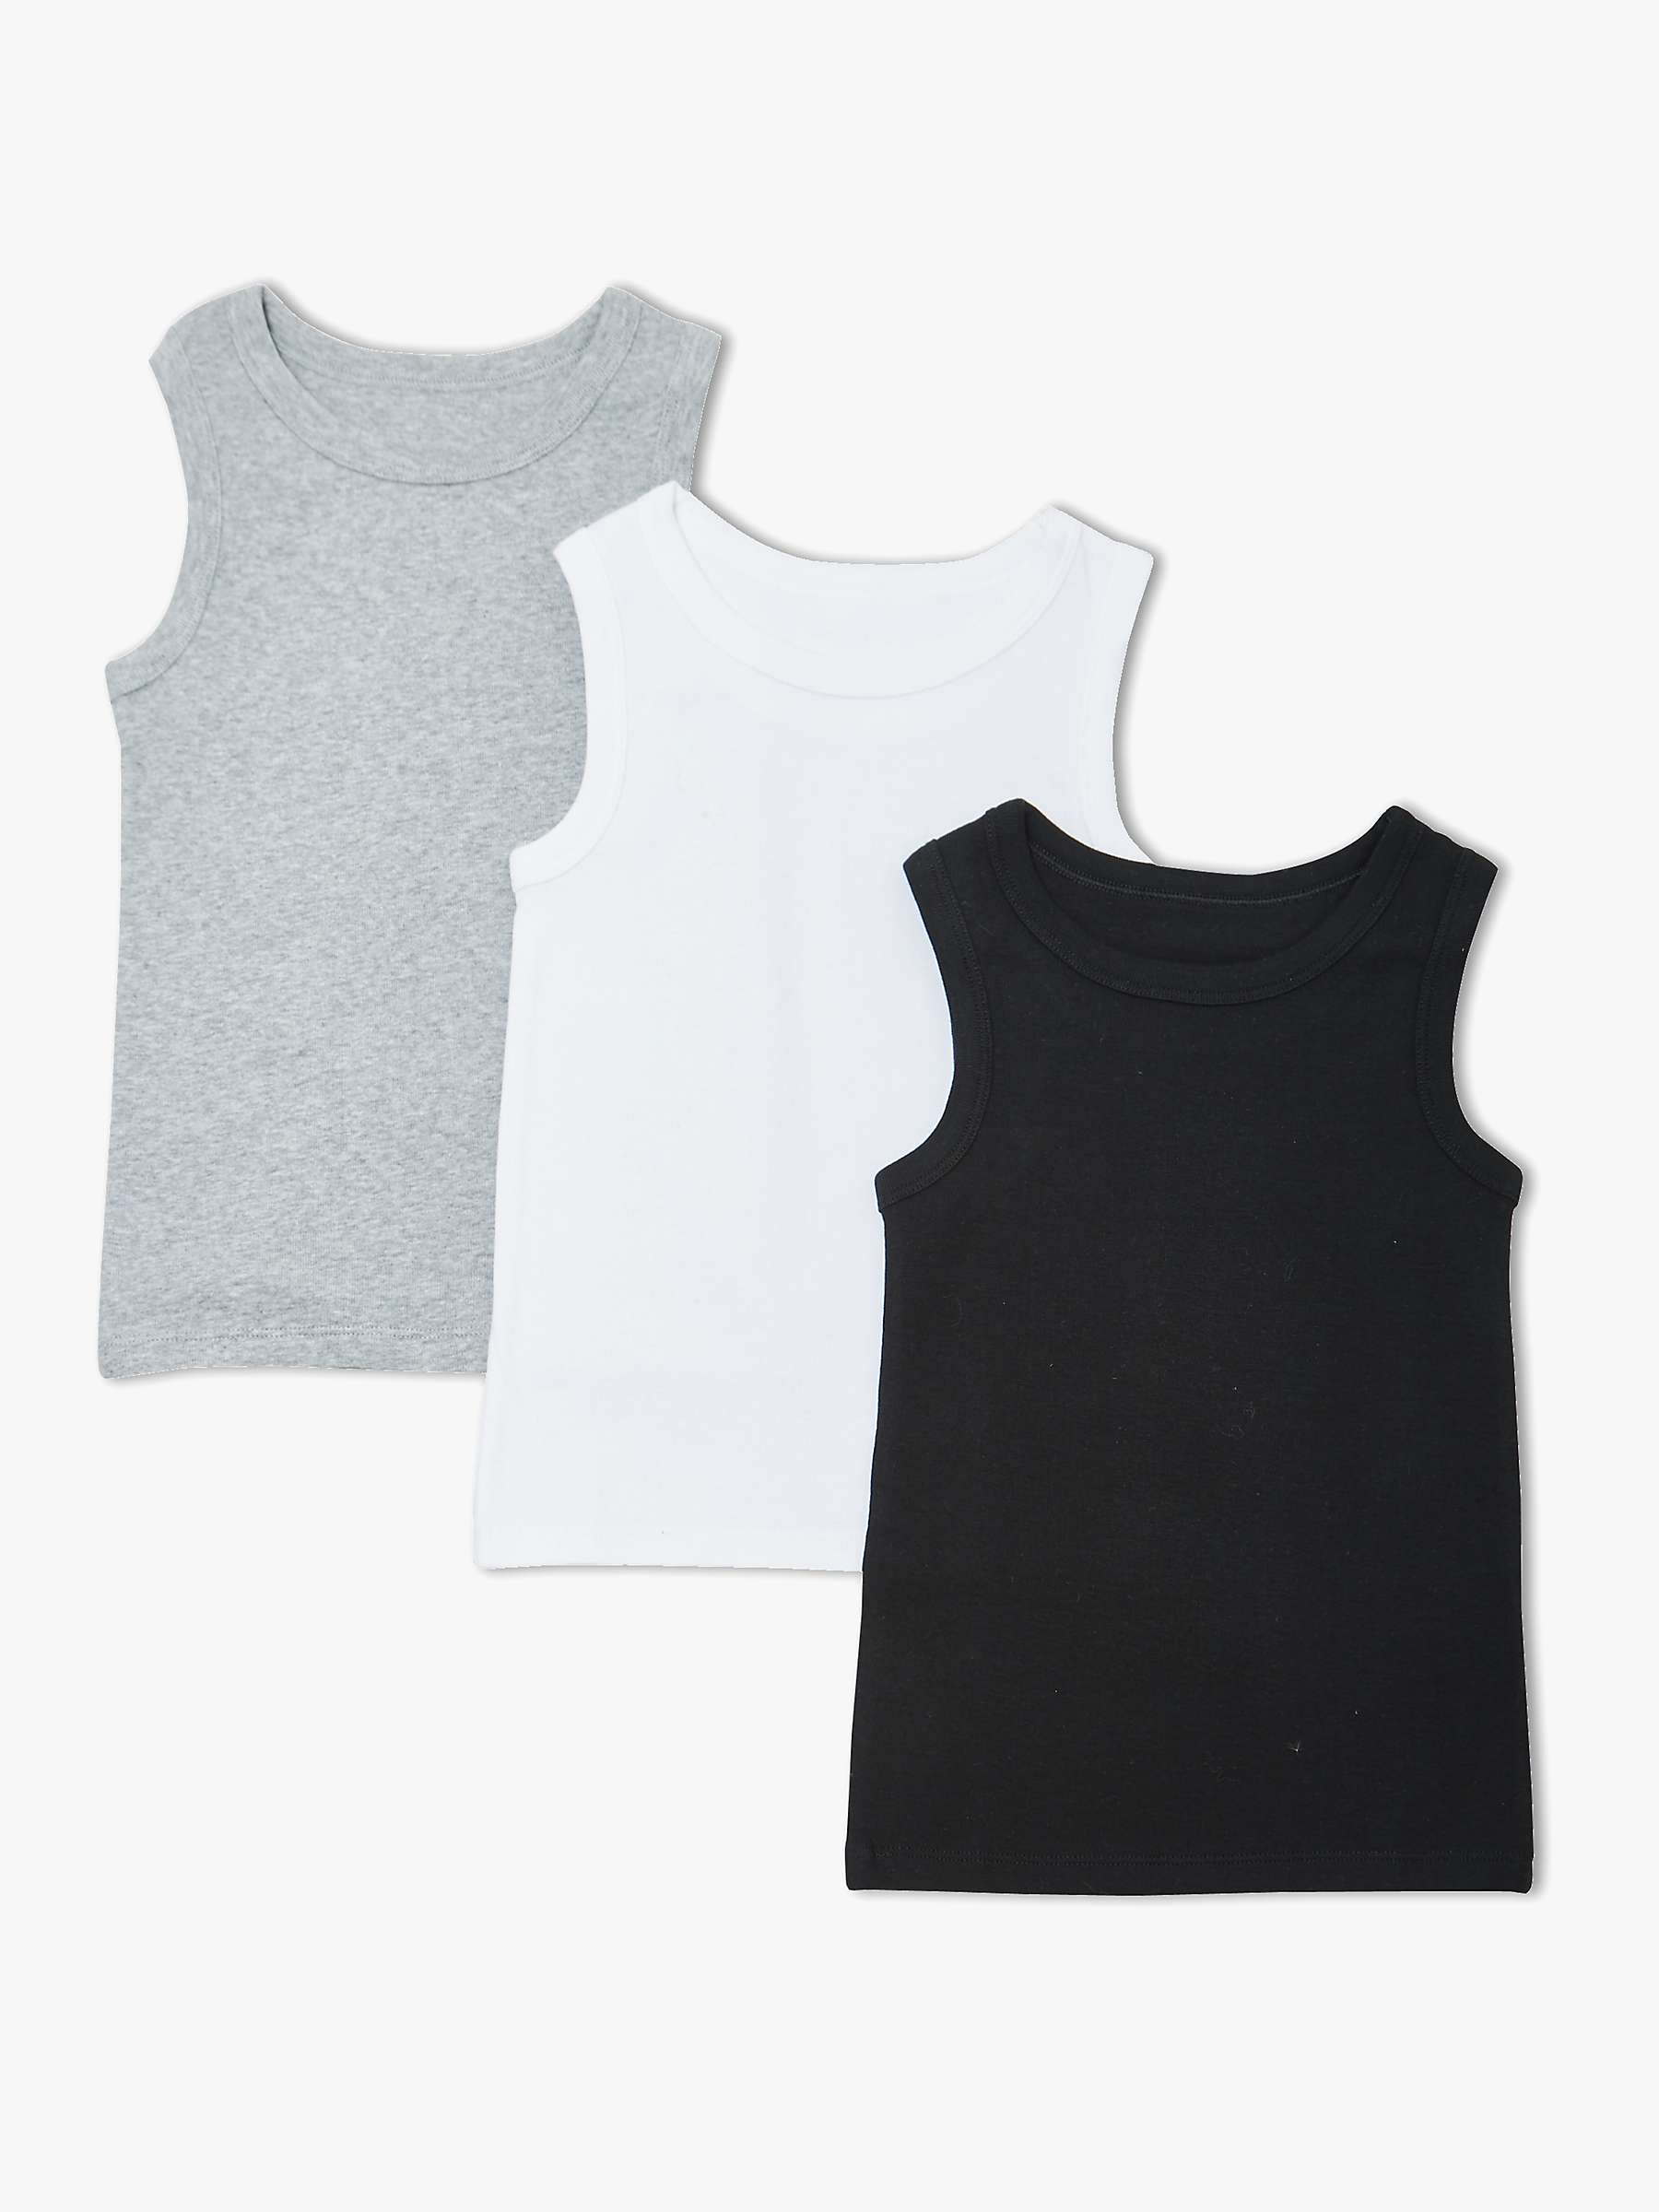 John Lewis & Partners Boys' Plain Vests, Pack of 3, Black/White at John  Lewis & Partners